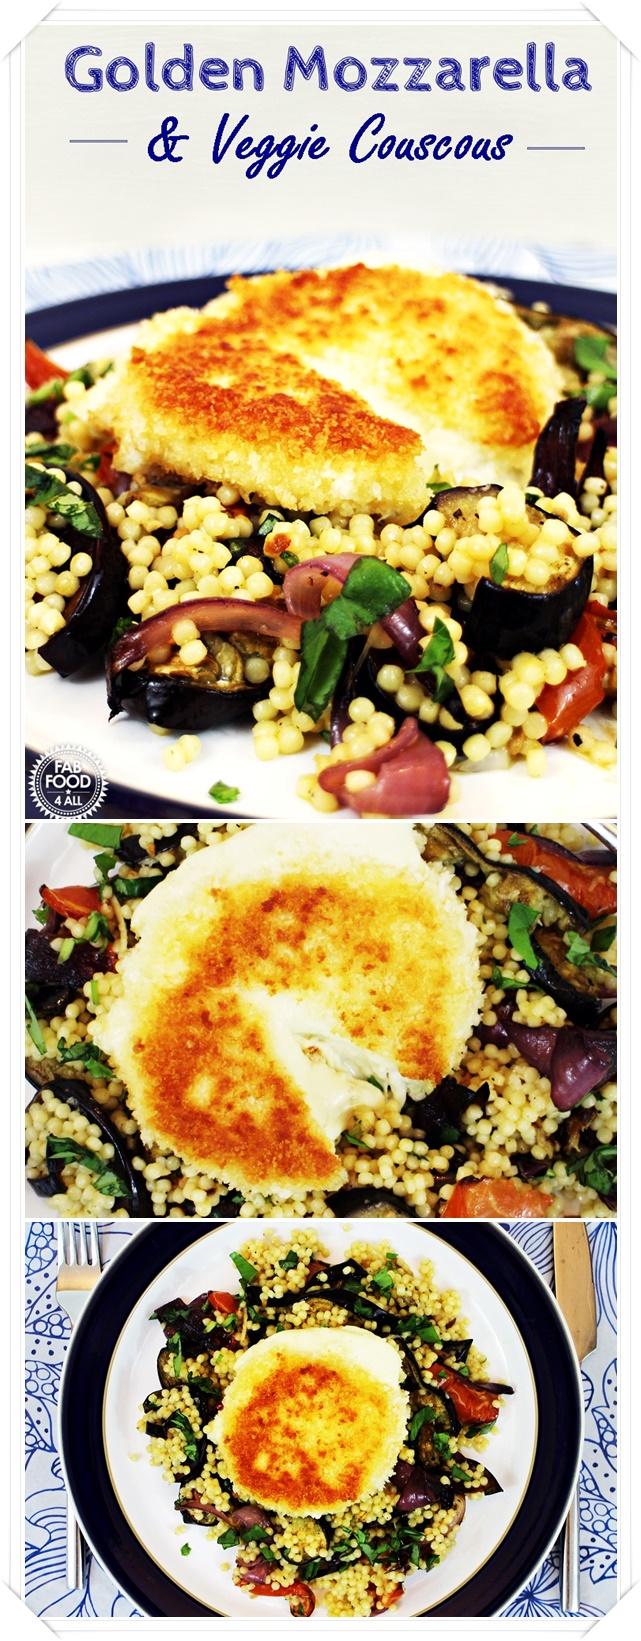 Golden Mozzarella & Veggie Couscous + Gousto Review